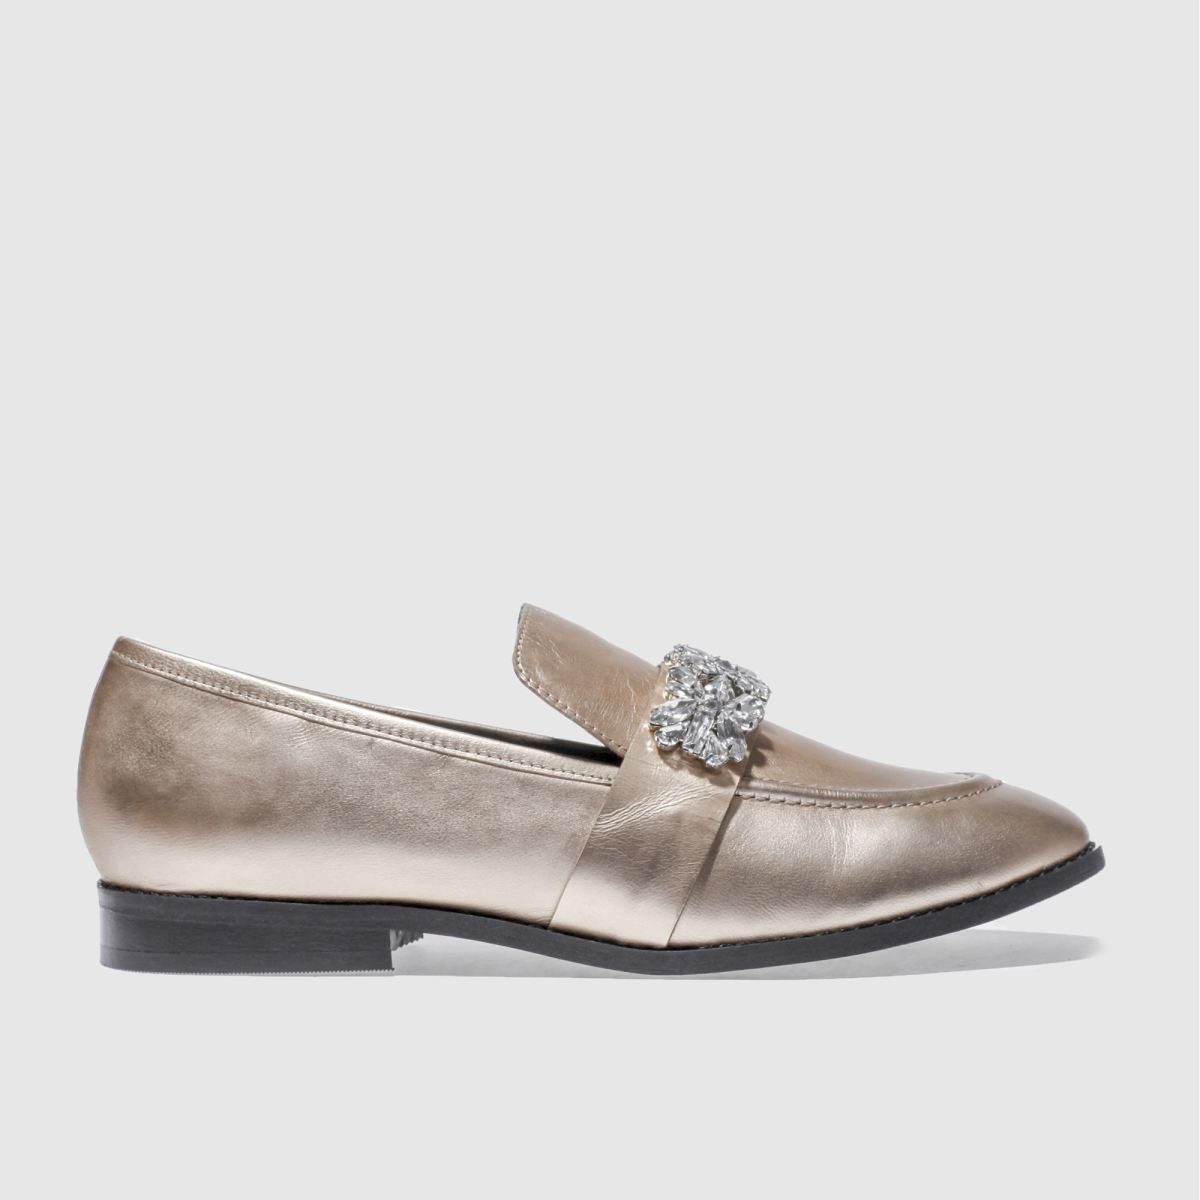 schuh gold lavish flat shoes